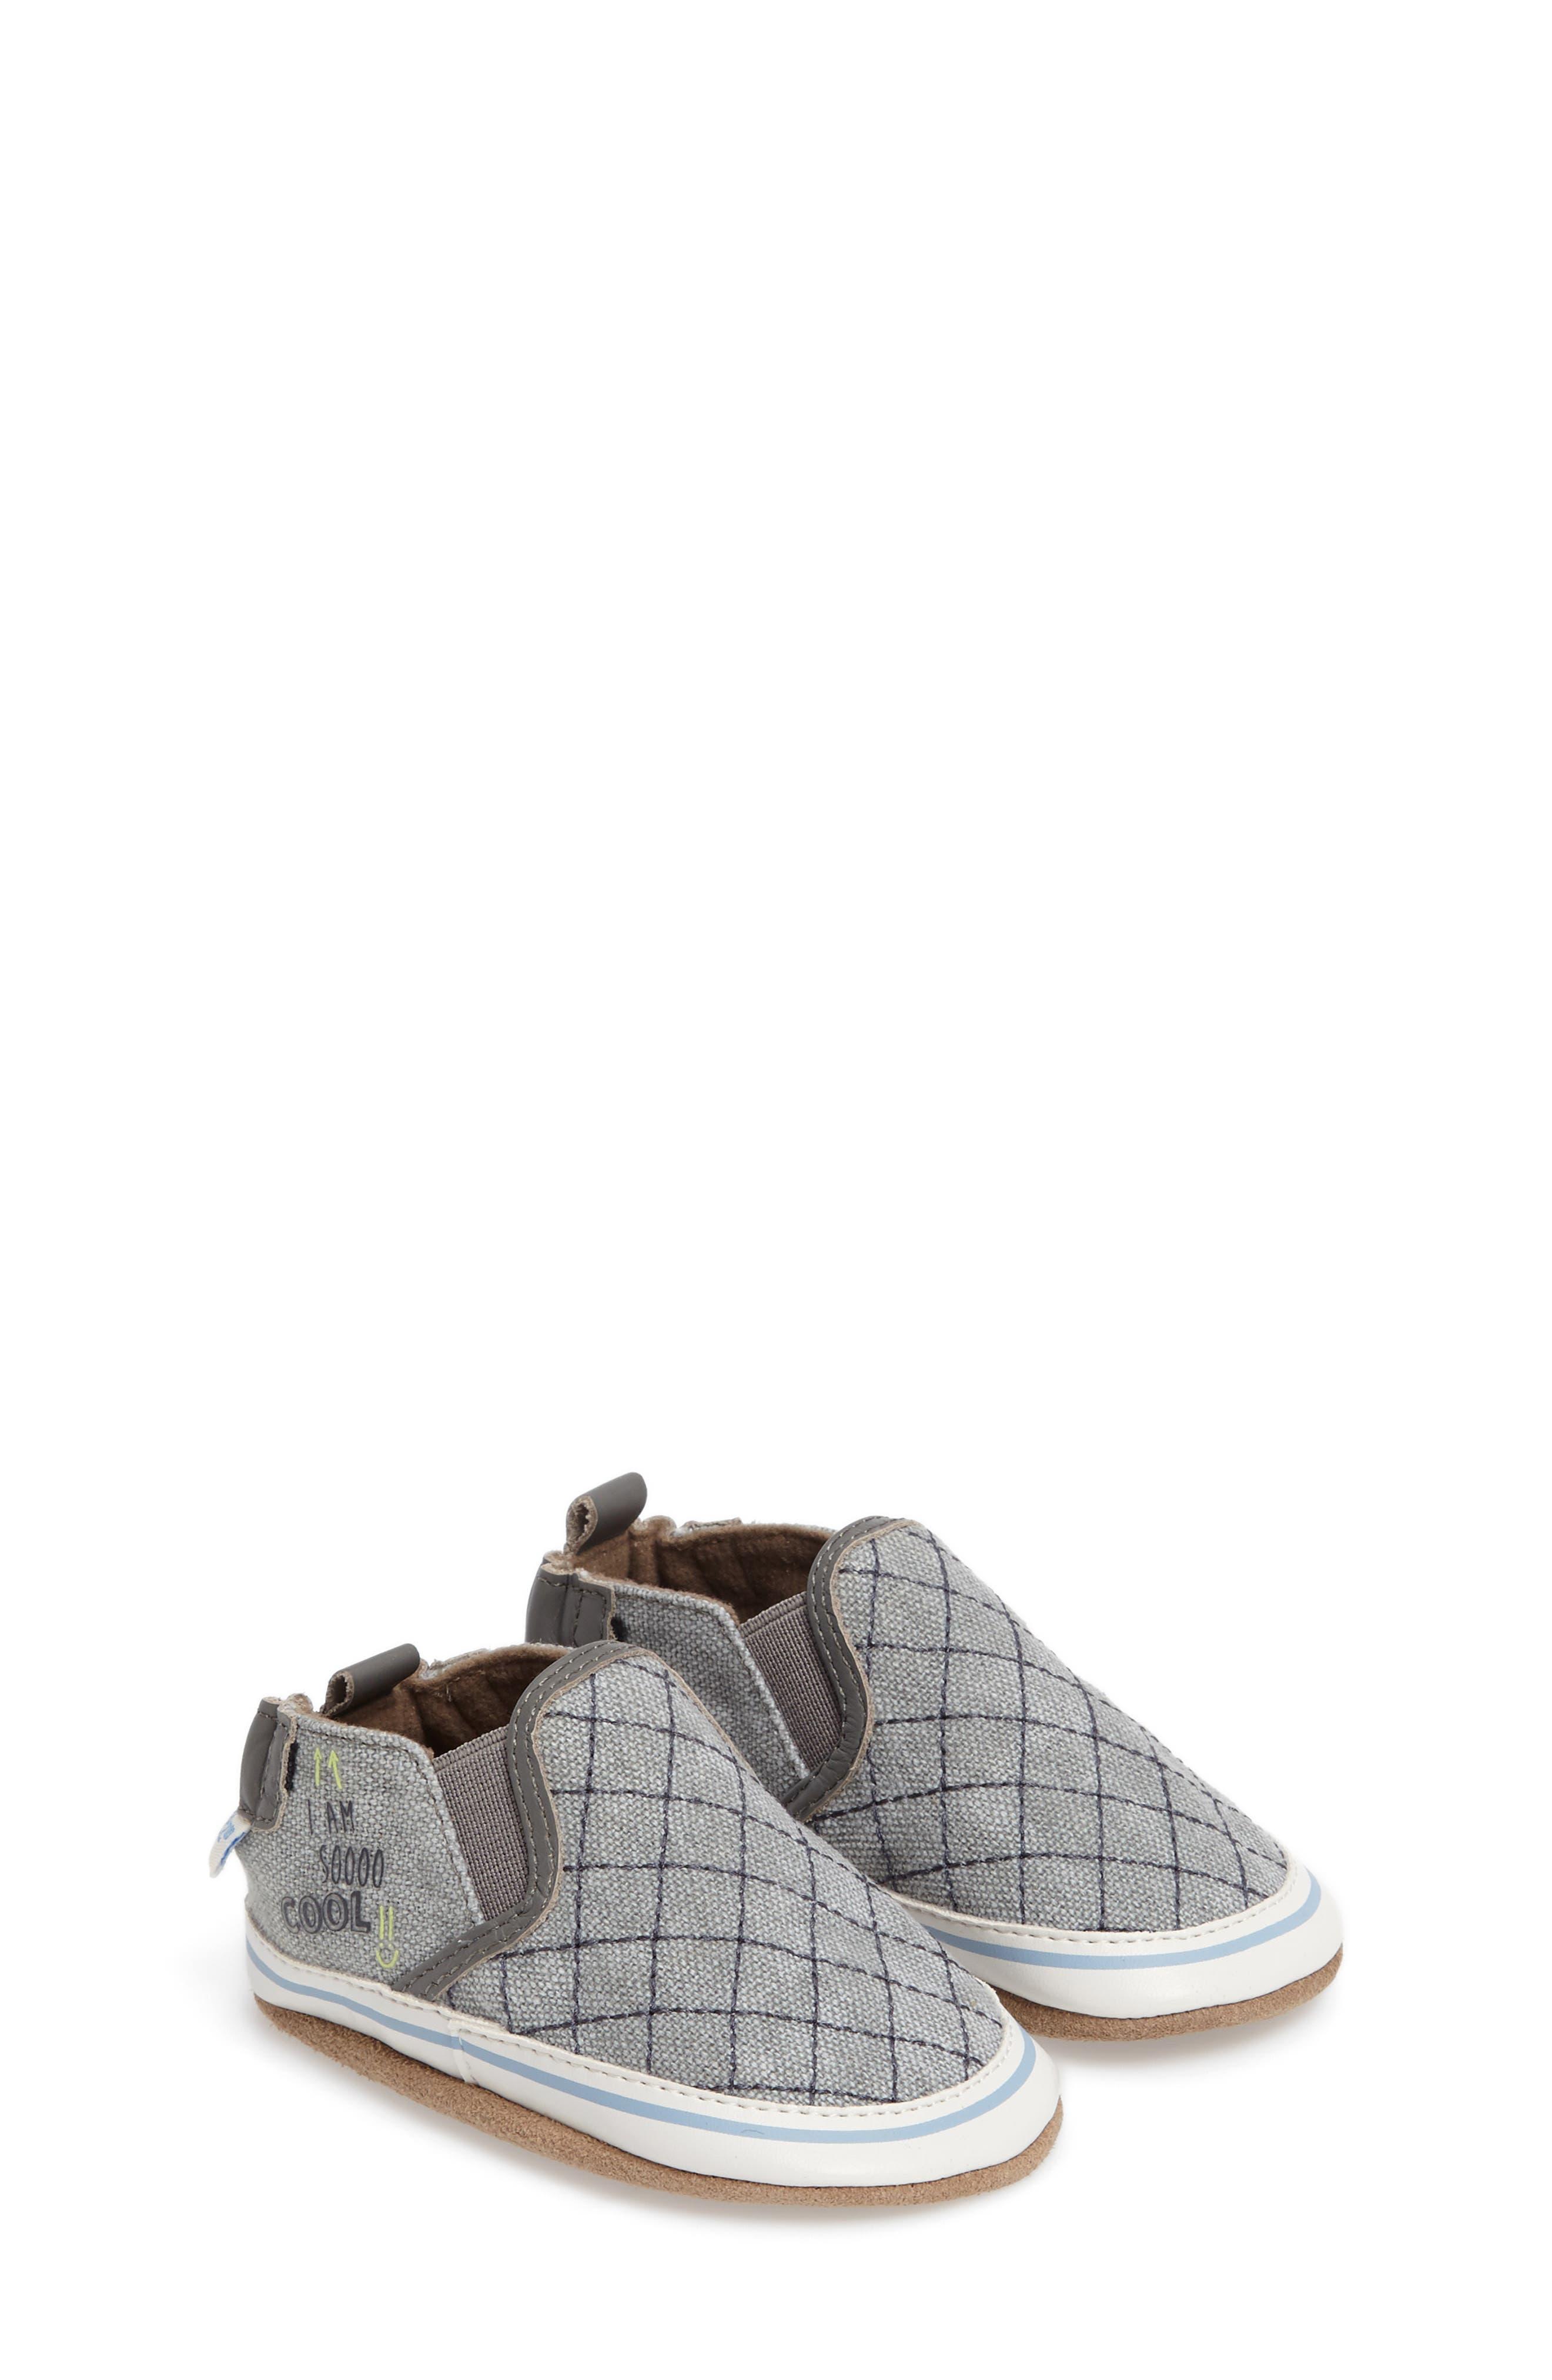 Liam - Cool Dude Crib Shoe,                         Main,                         color, 020